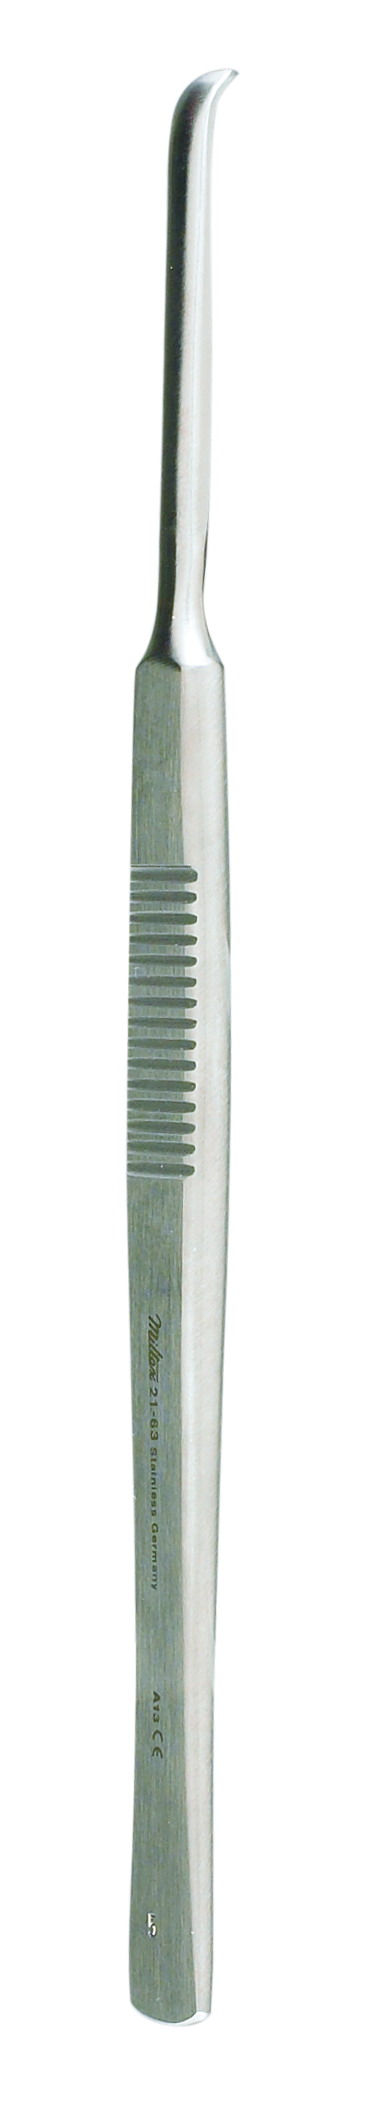 mckenty-elevator-5-1-2-14-cm-curved-tip-5-mm-wide-21-63-miltex.jpg